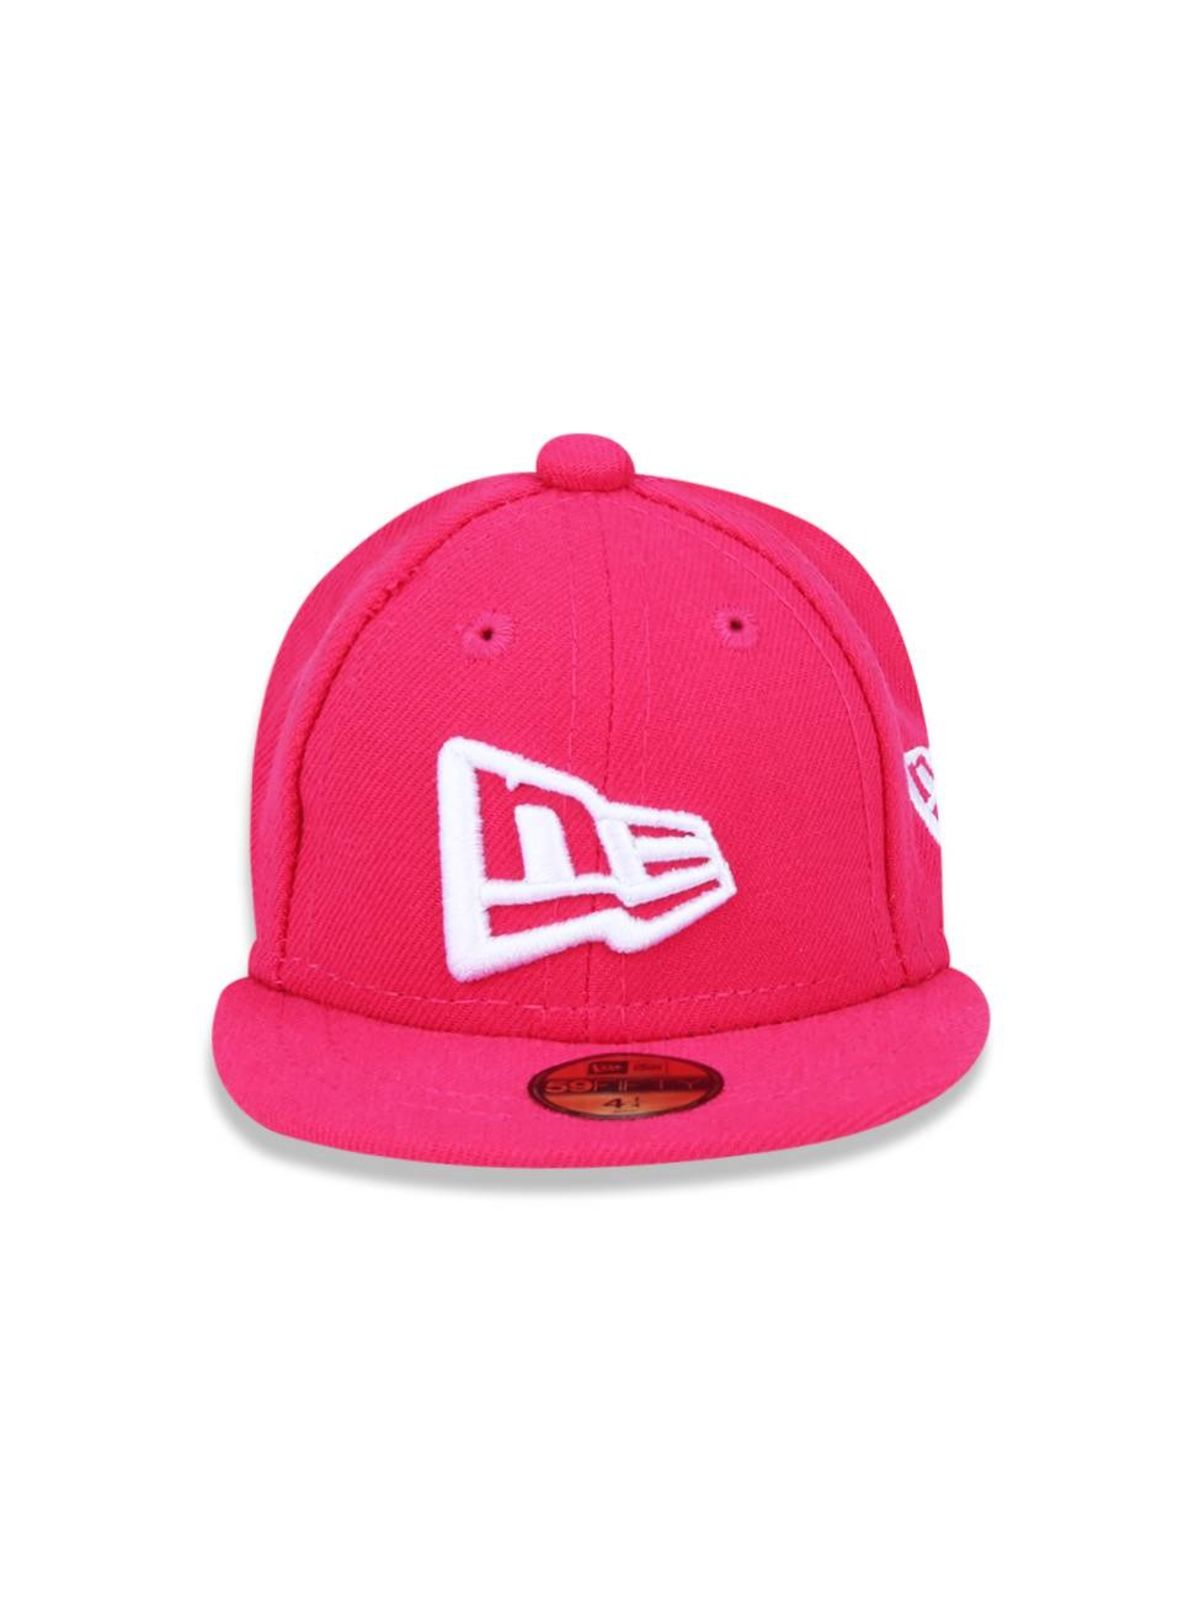 Boné New Era 950 New Era Brasil Aba Reta Pink  e4b31216ba6